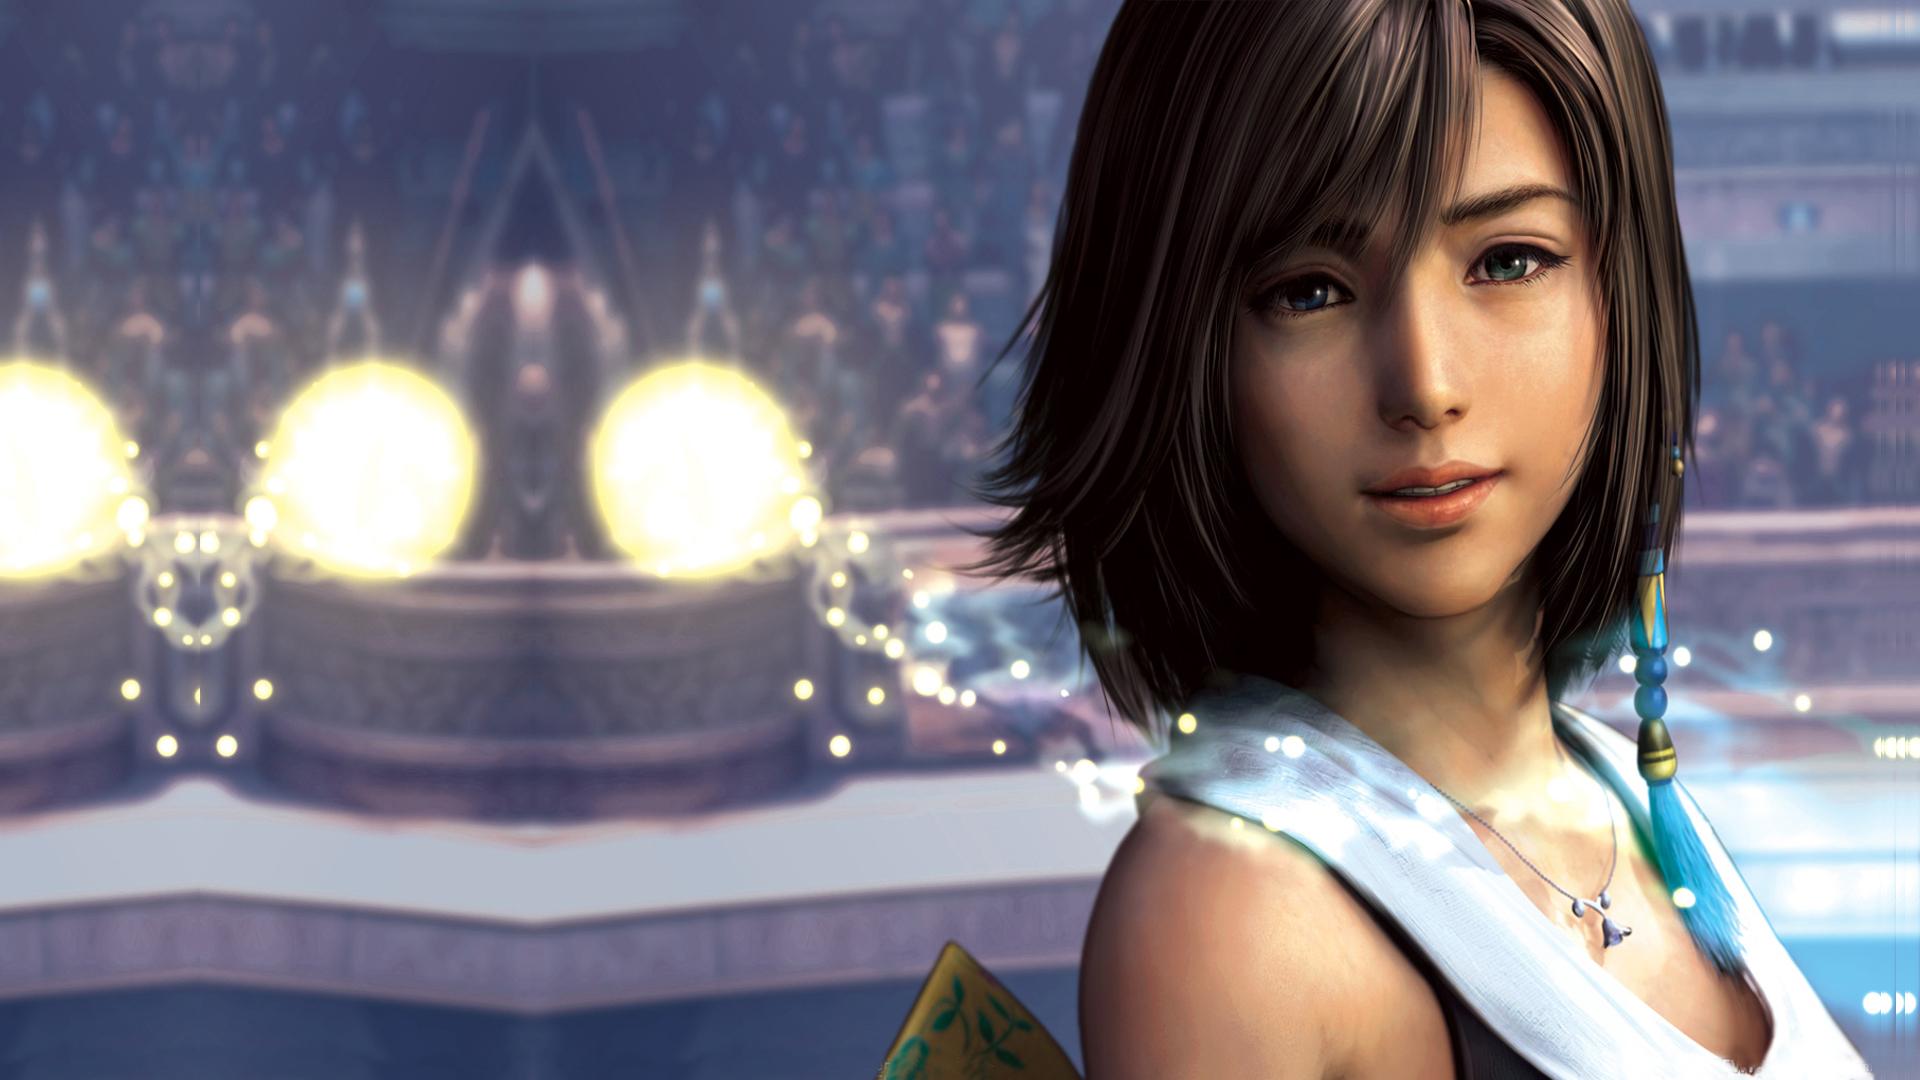 Final Fantasy IX Jeu Playstation   Images vidos astuces et avis 1920x1080